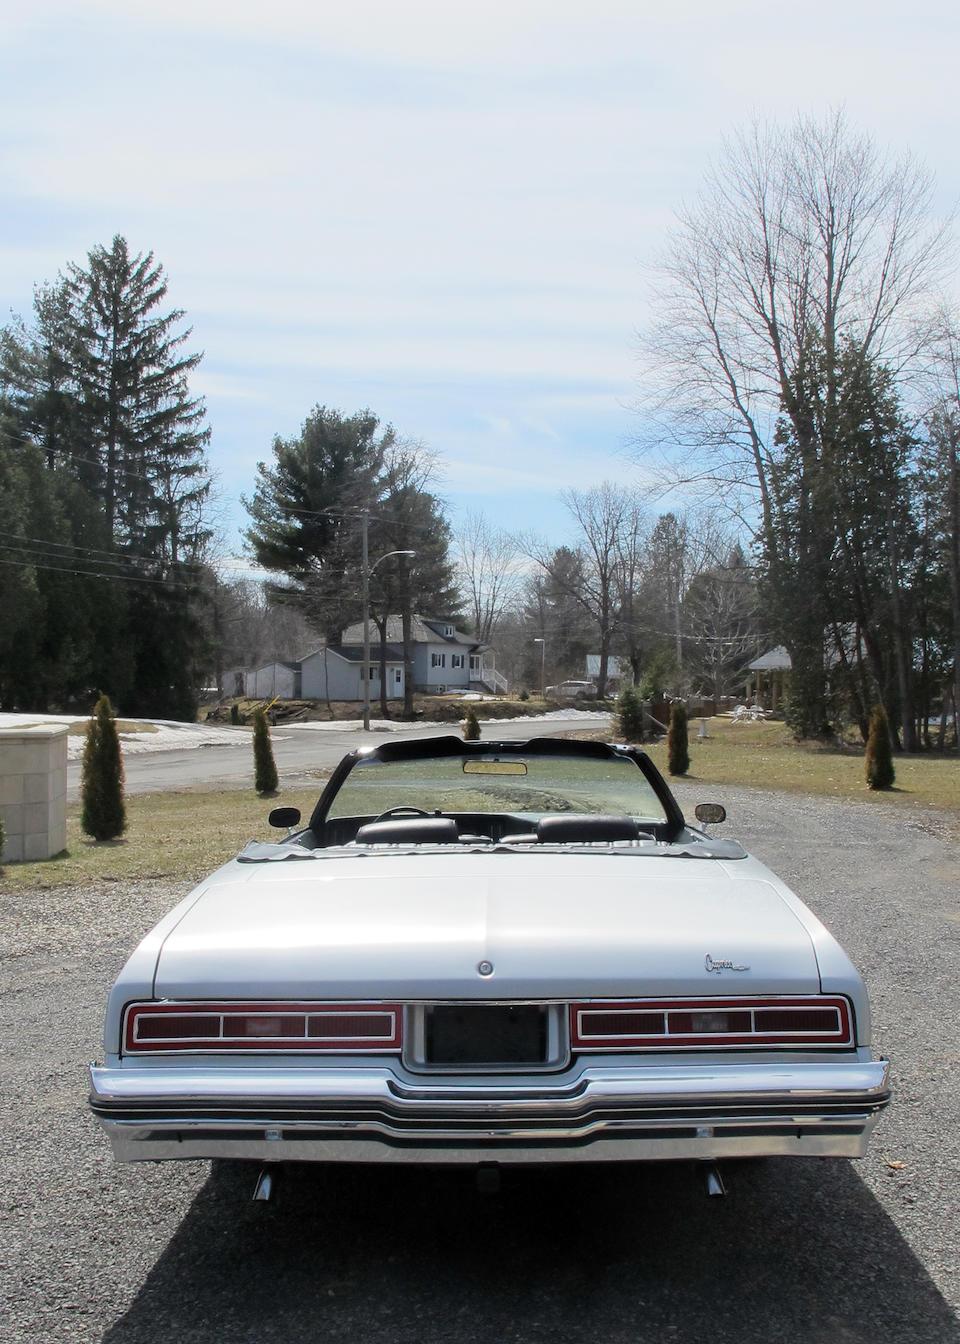 Bonhams : 1977 Chevrolet Caprice Convertible Chassis no